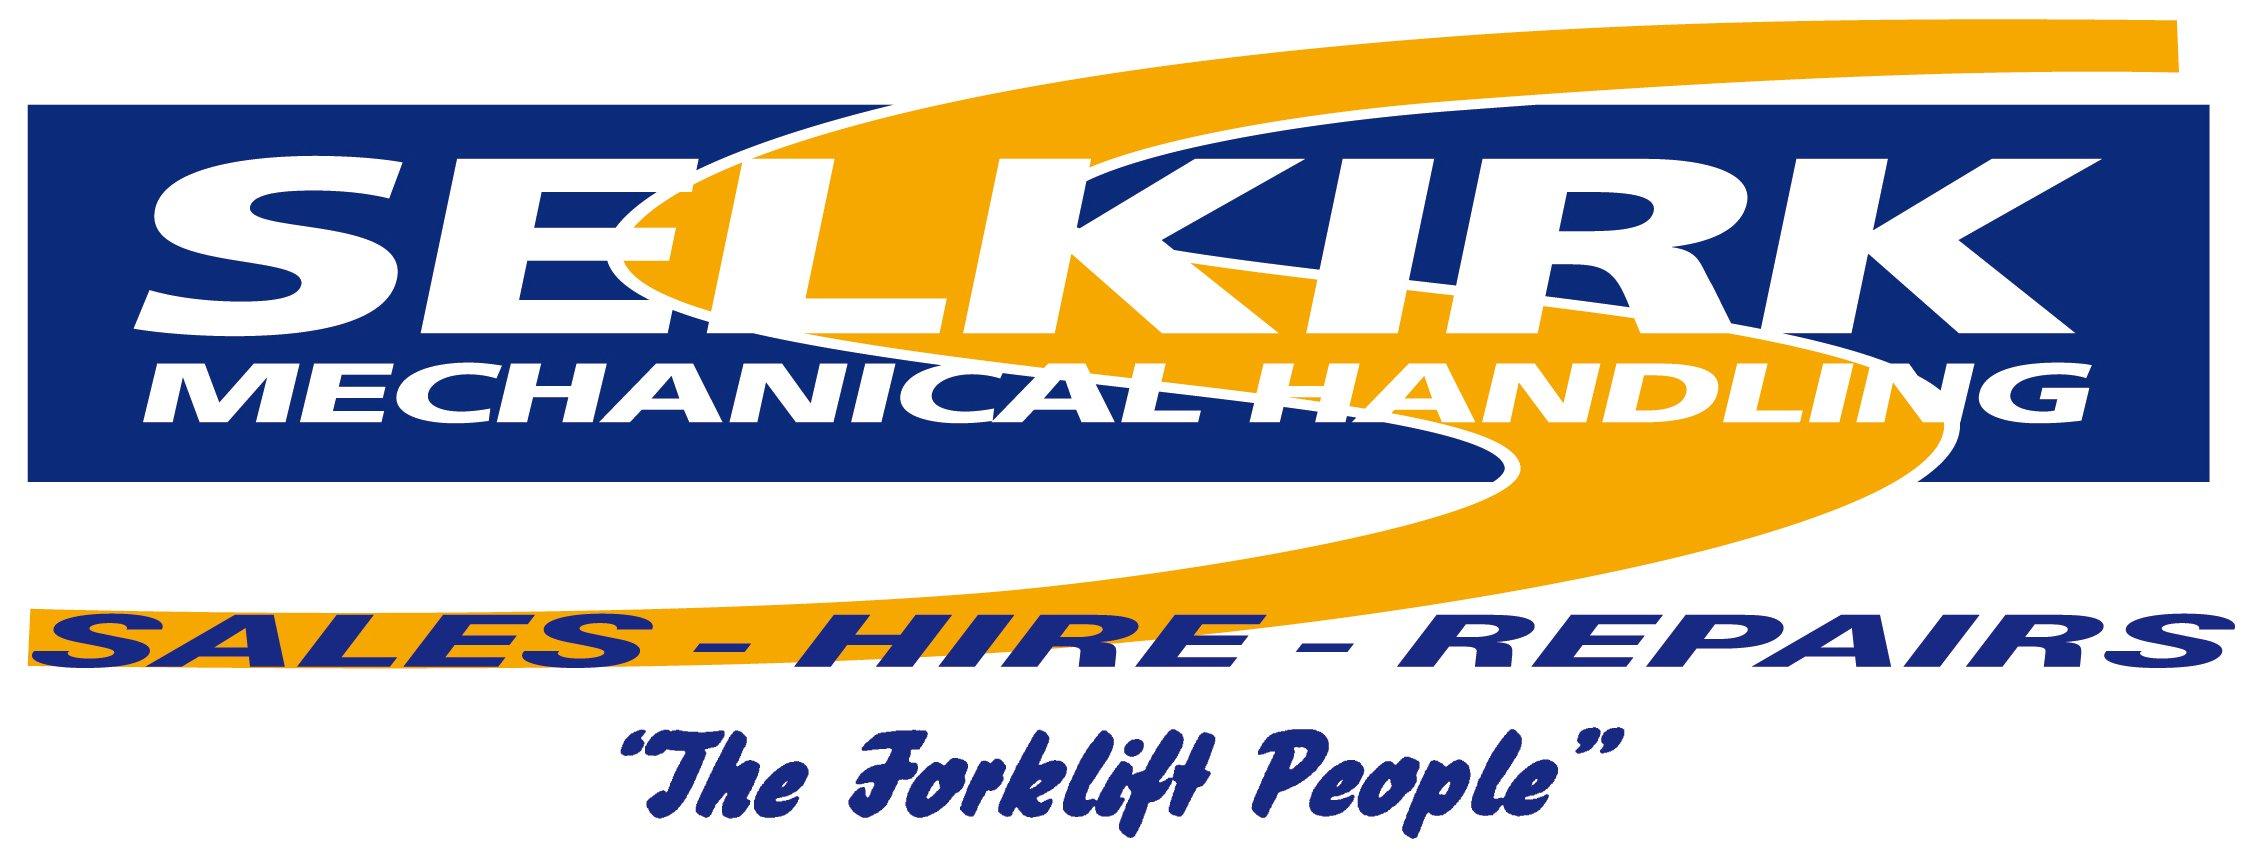 Selkirk Mechanical Handling logo